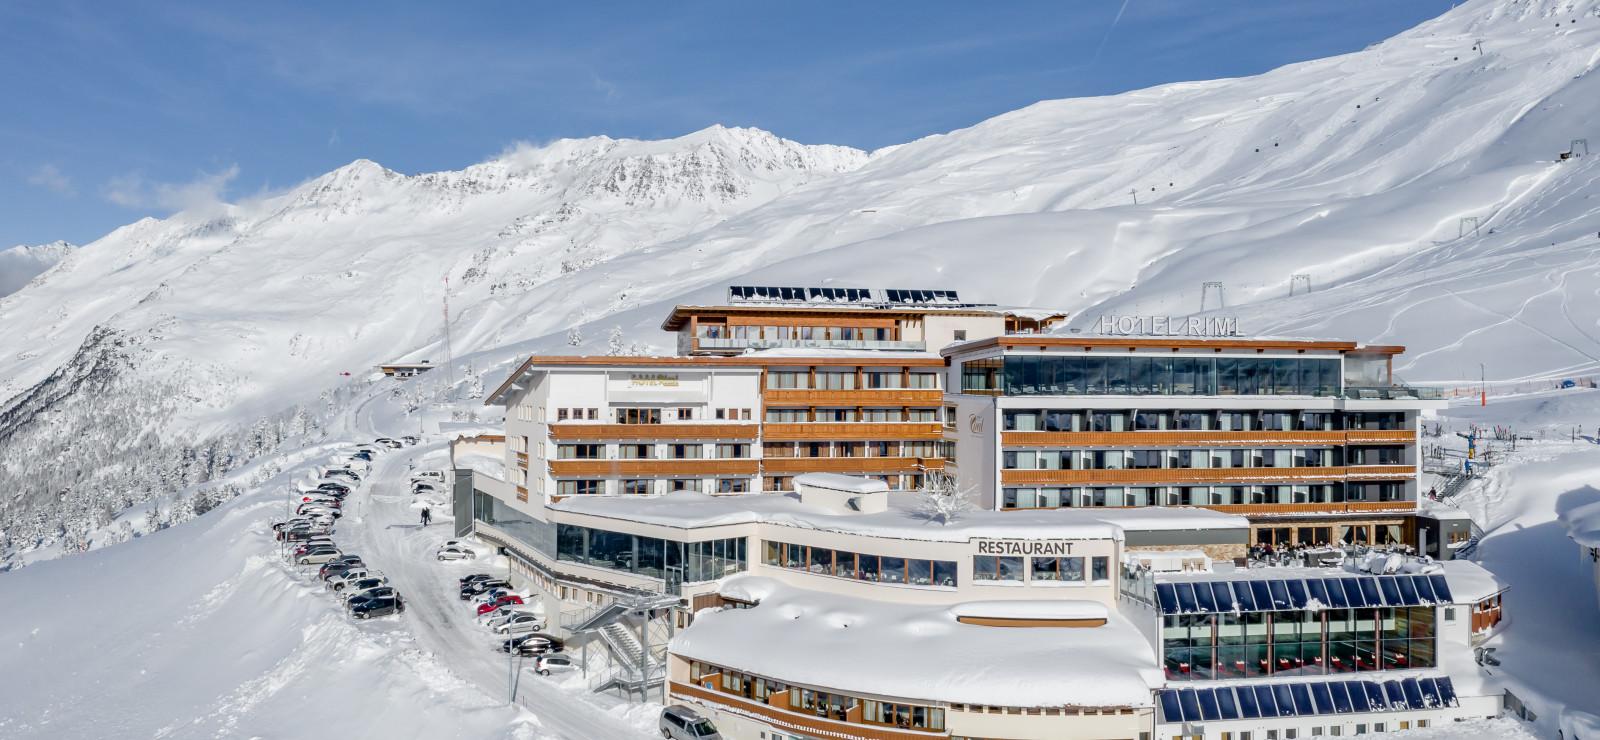 Ski- & Golfresort Hotel Riml Bilder | Bild 1